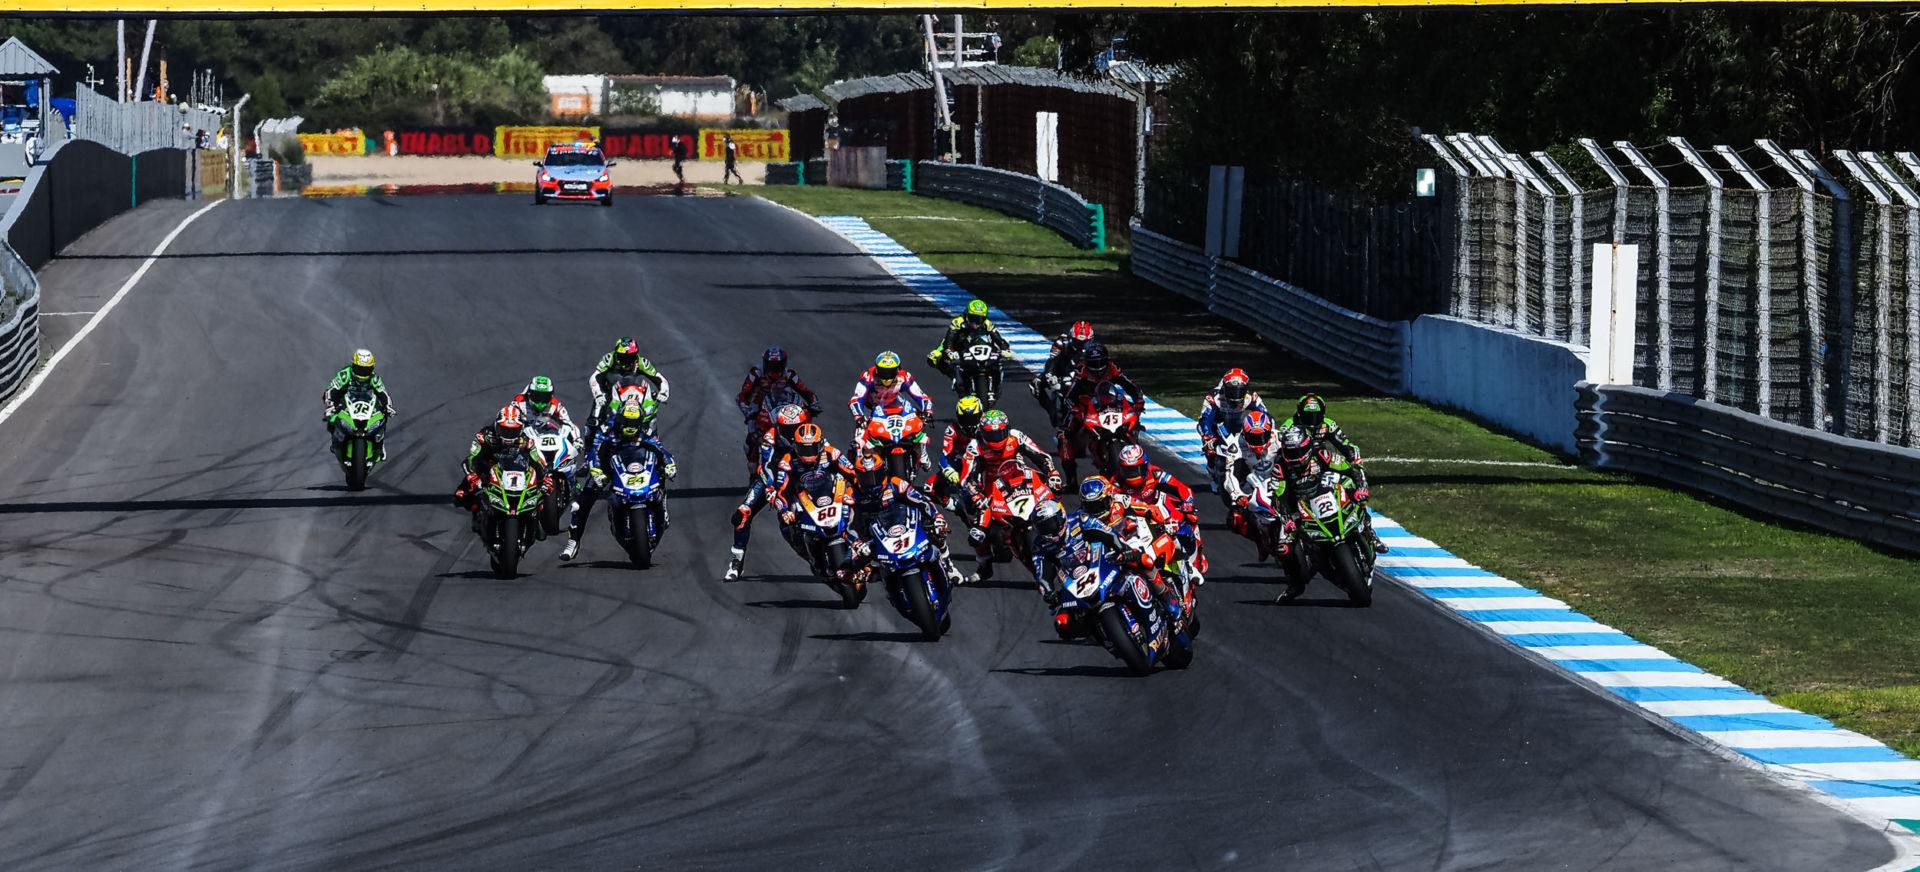 The start of World Superbike Race One. Photo courtesy Dorna.